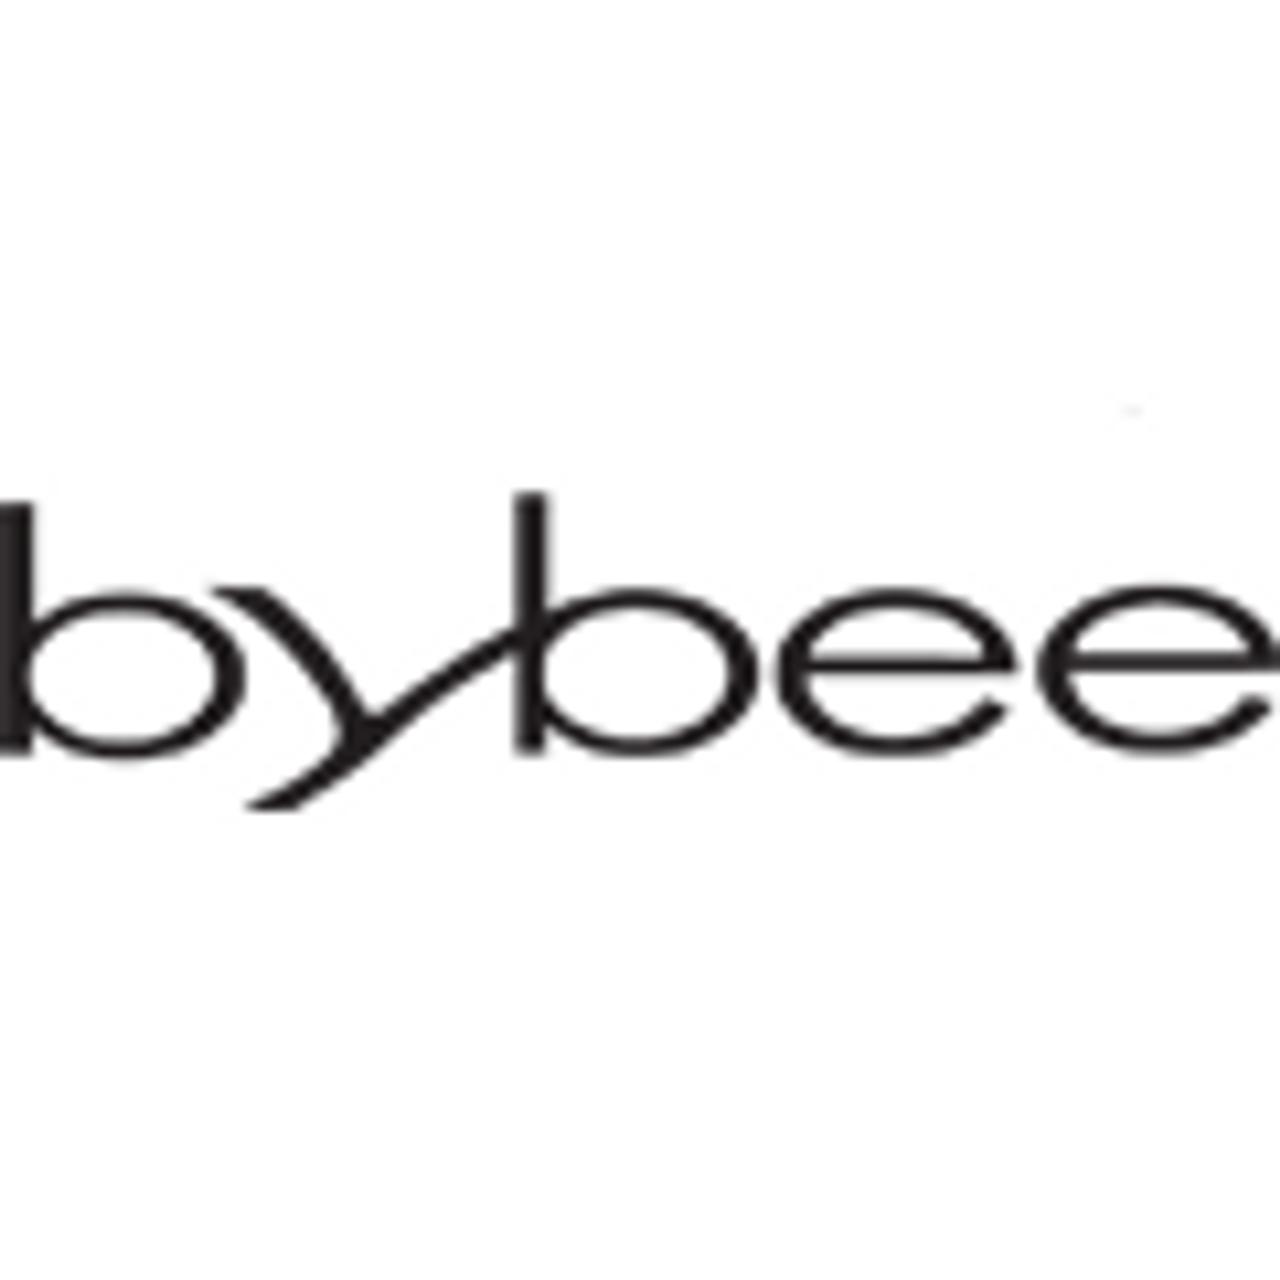 Bybee